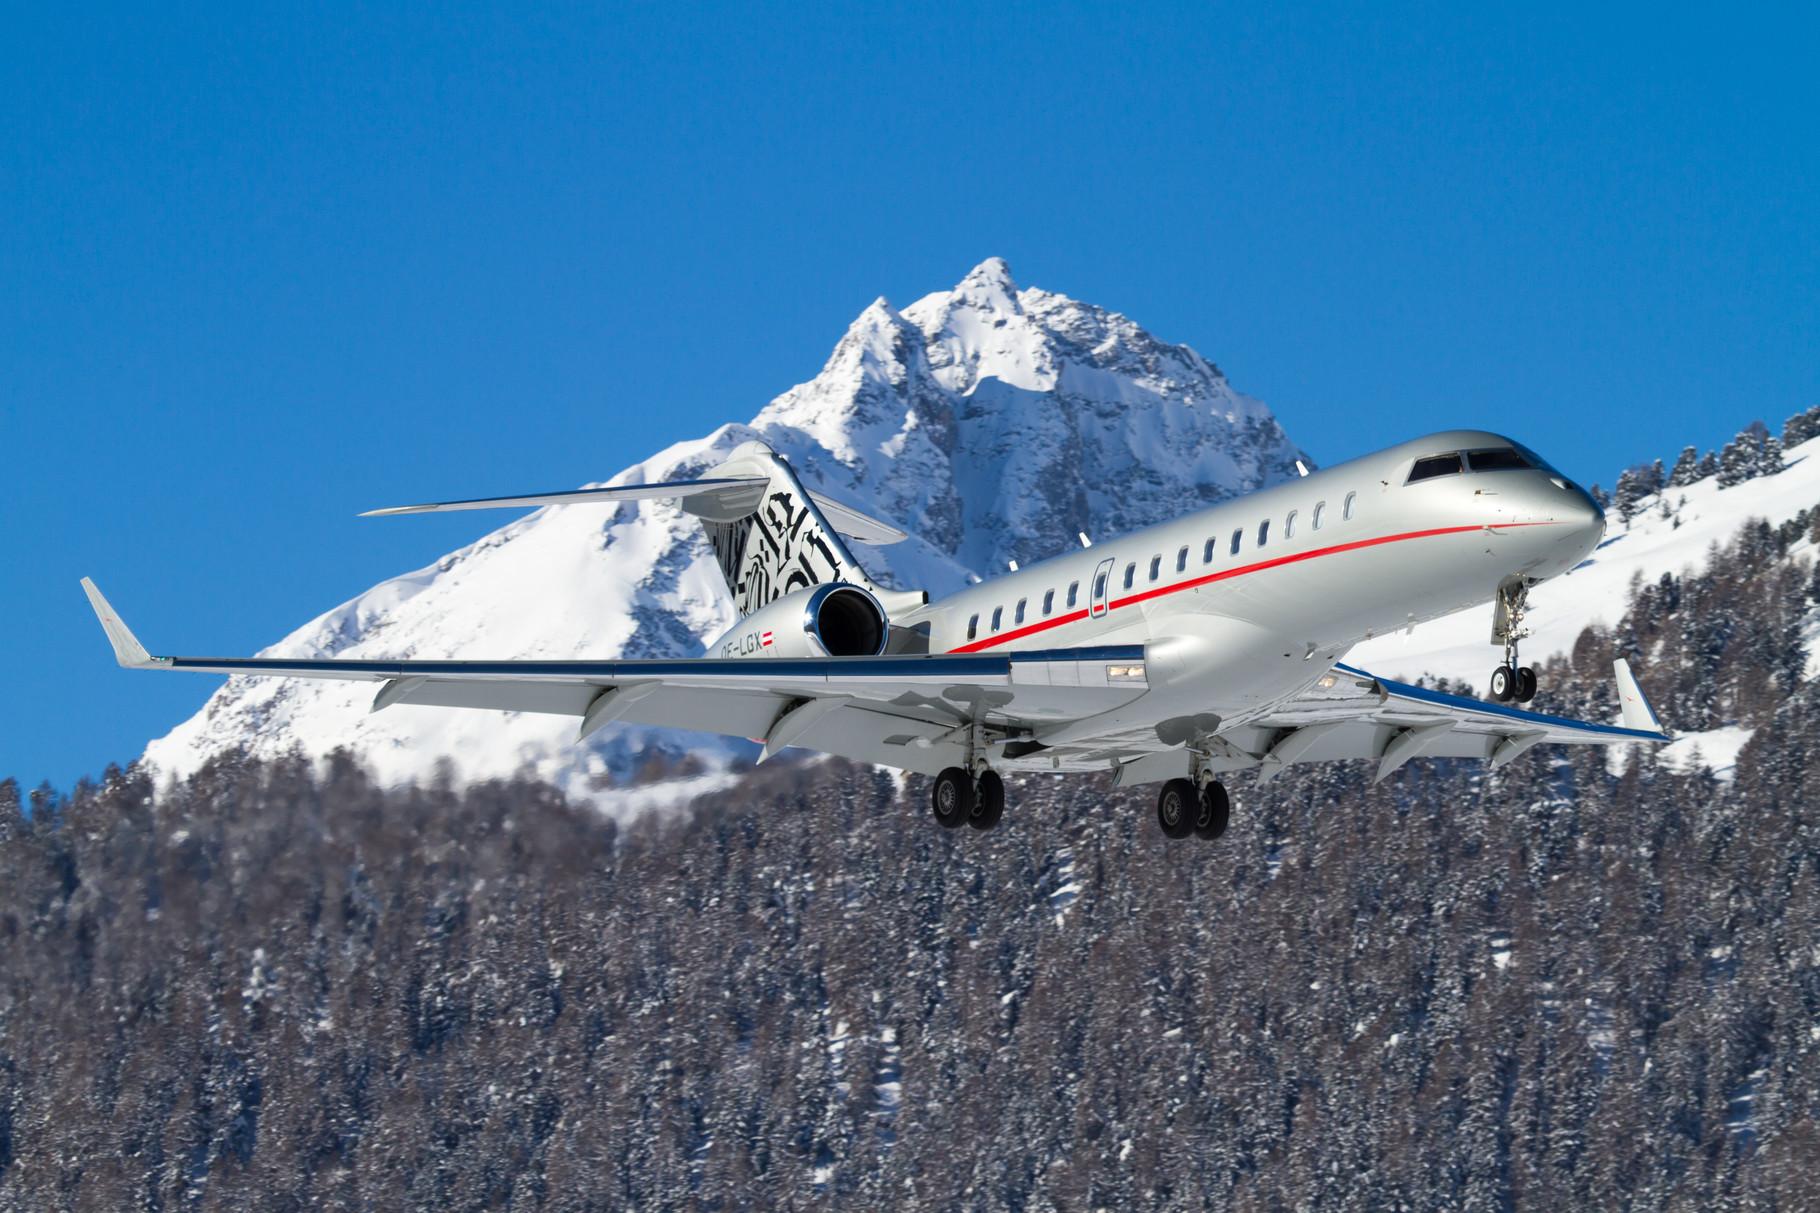 VistaJet Global Express approaching Winter Wonderland... Samedan - St.Moritz, Switzerland